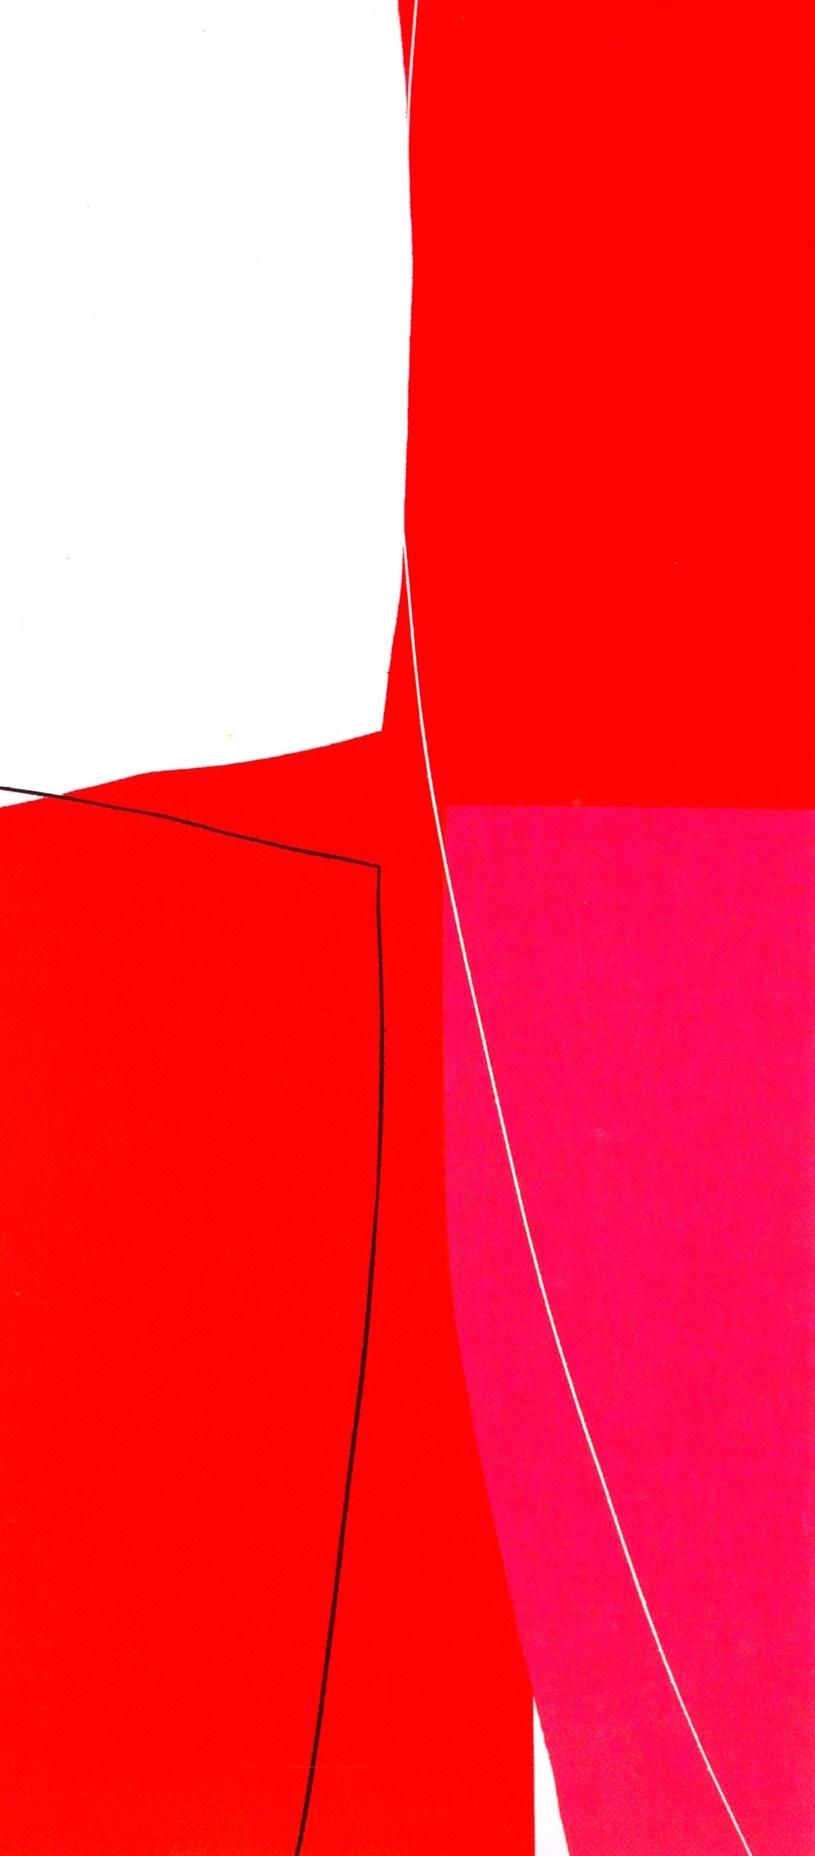 "Untitled: 07-26,   2007, Acrylic on Canvas, 46"" x 20.5"" (116.5 x 52cm)"